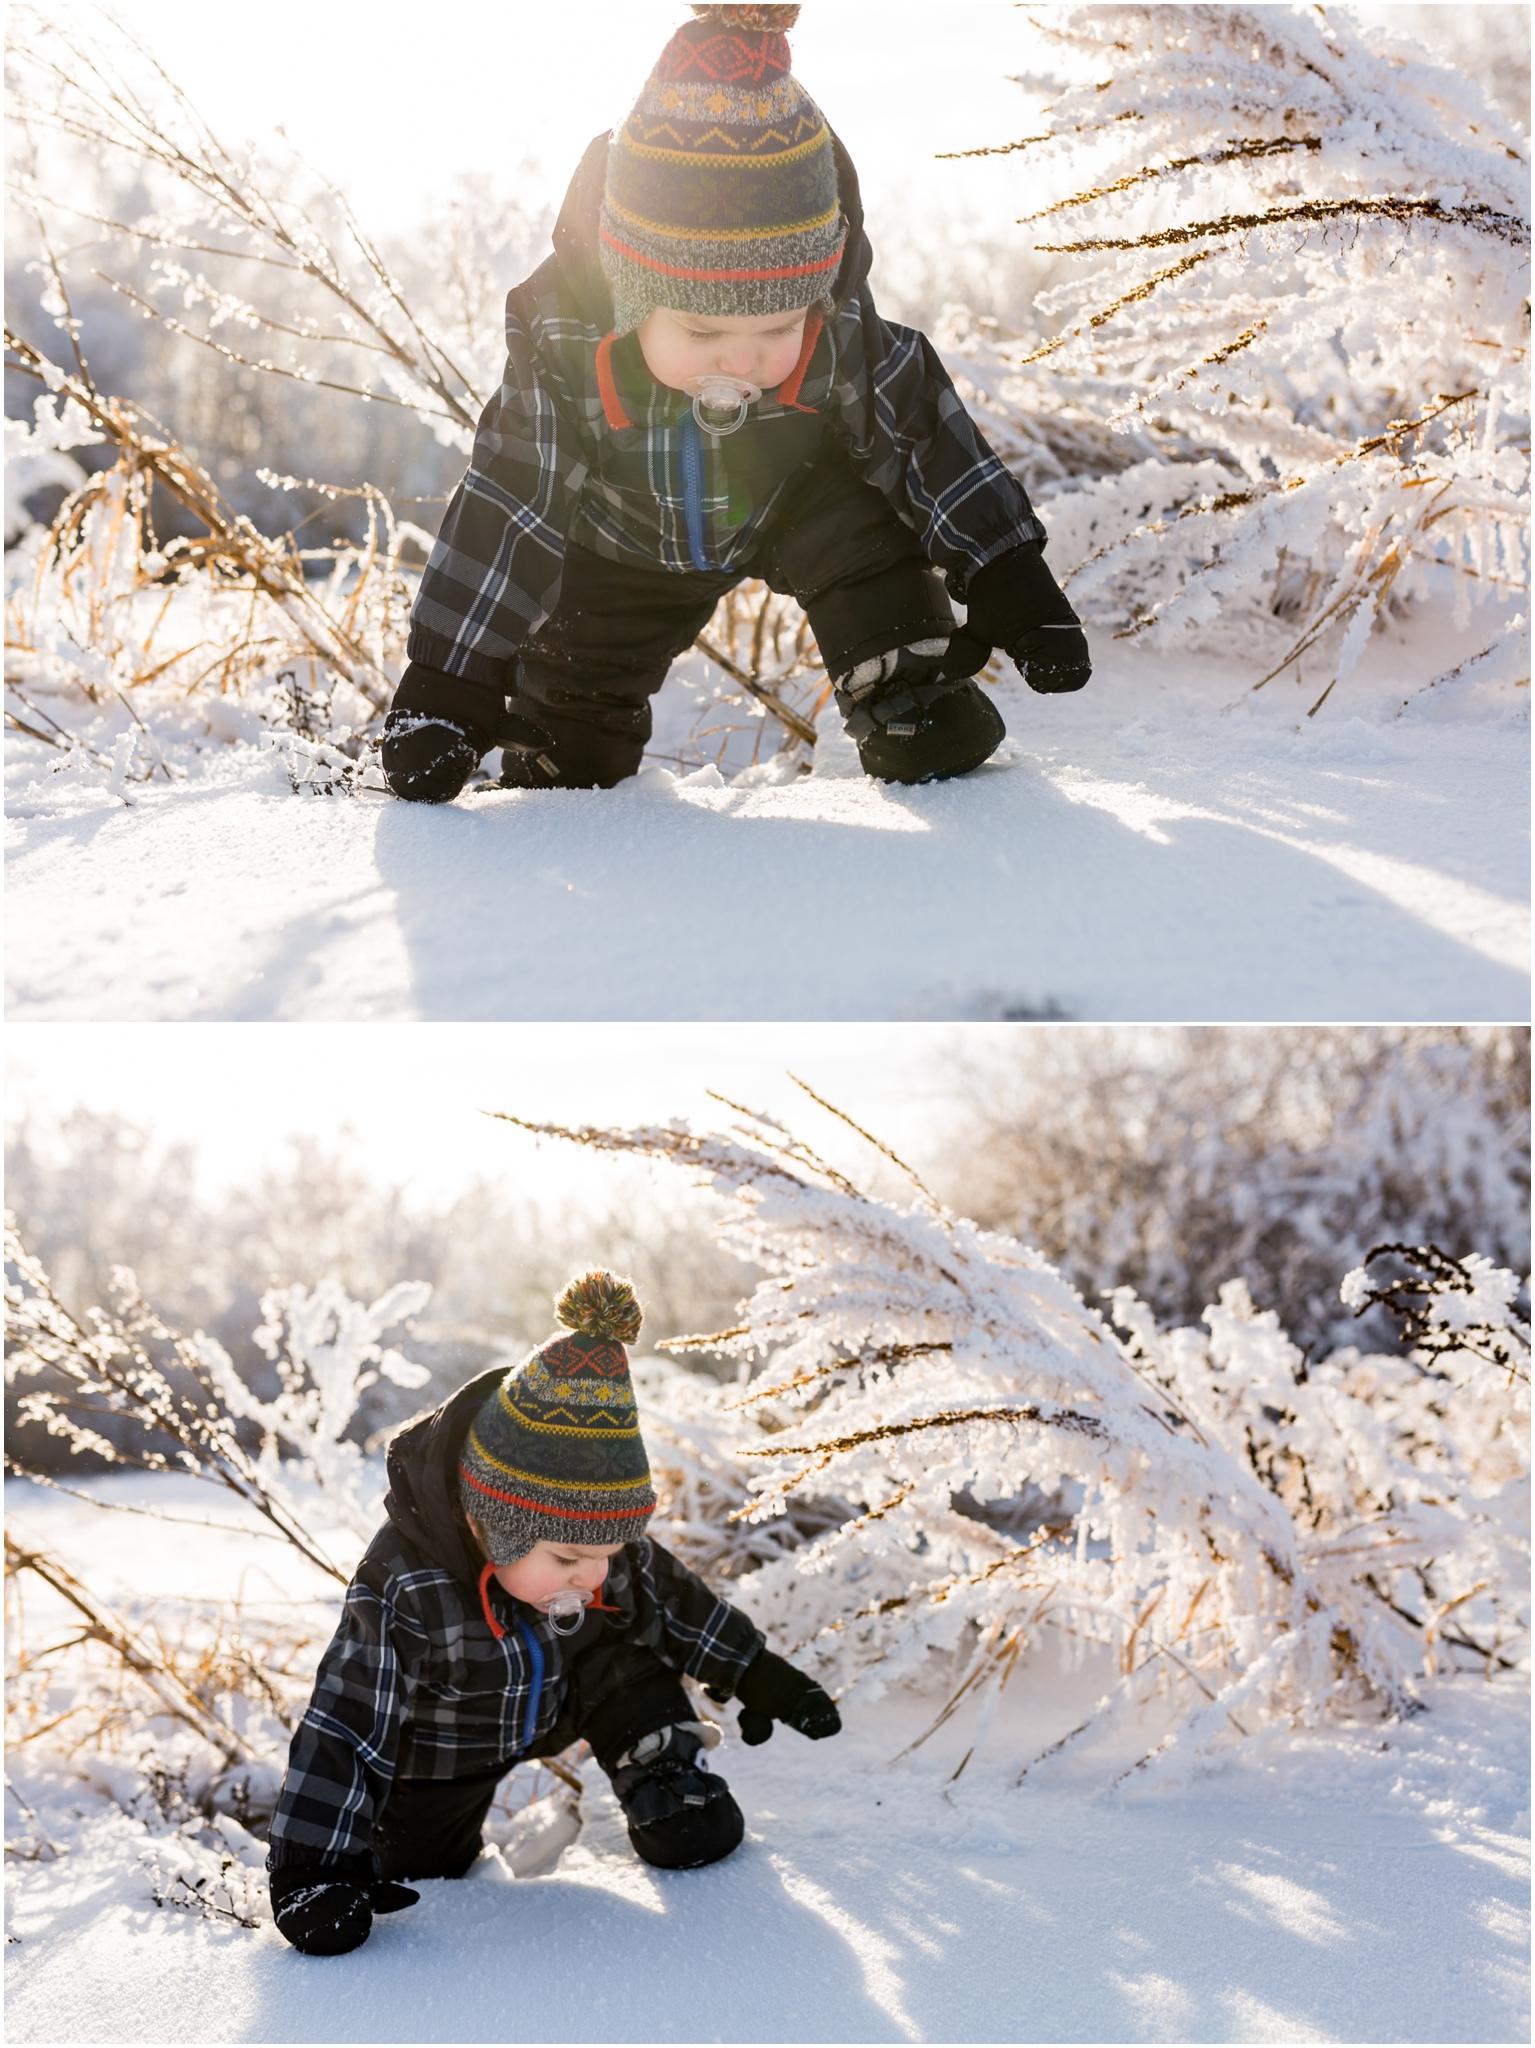 Treelines Photography - Edmonton Photographer - Toddler in Snow